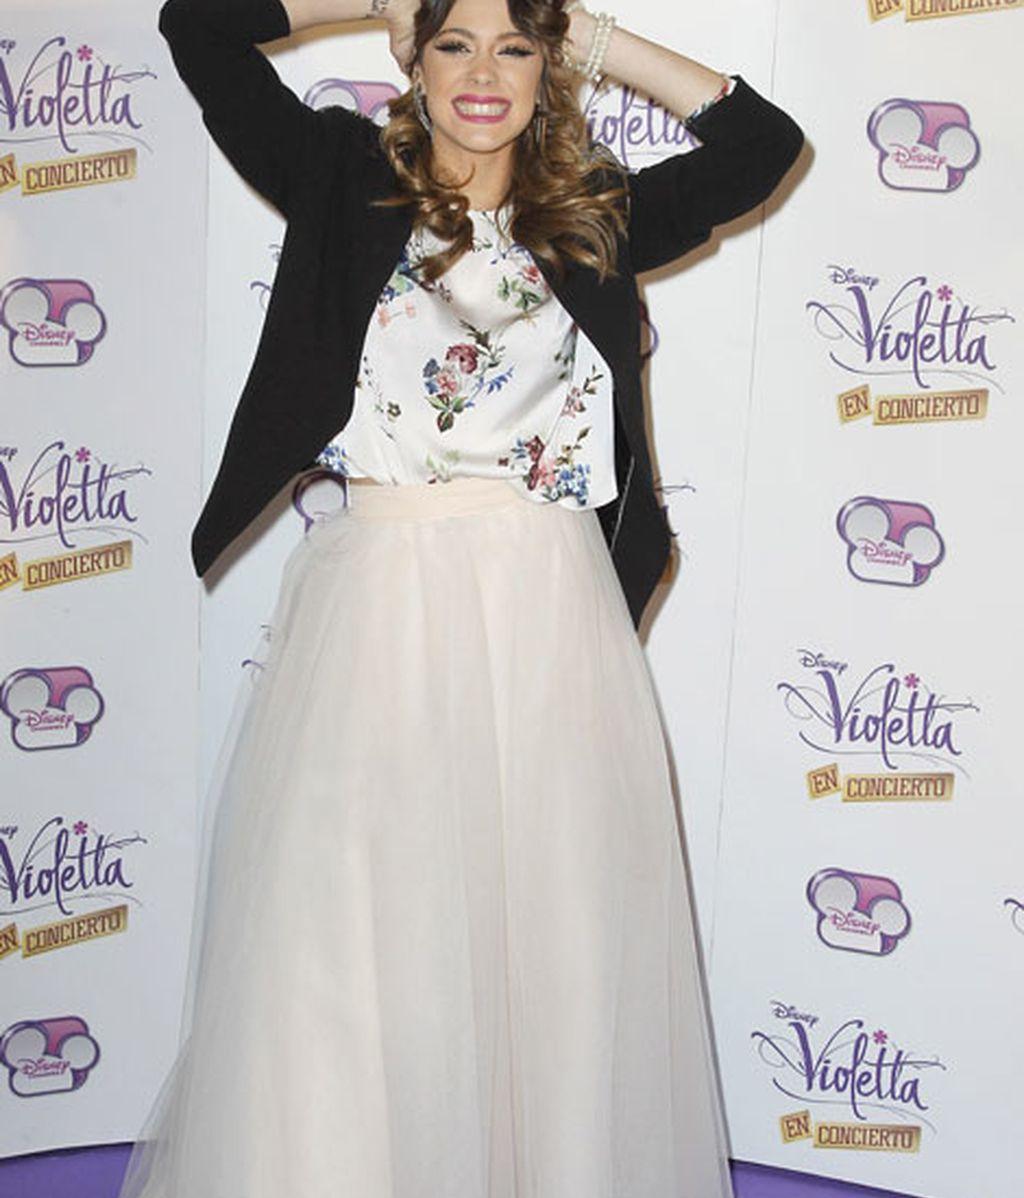 Martina Stoessel, protagonista de 'Violetta'